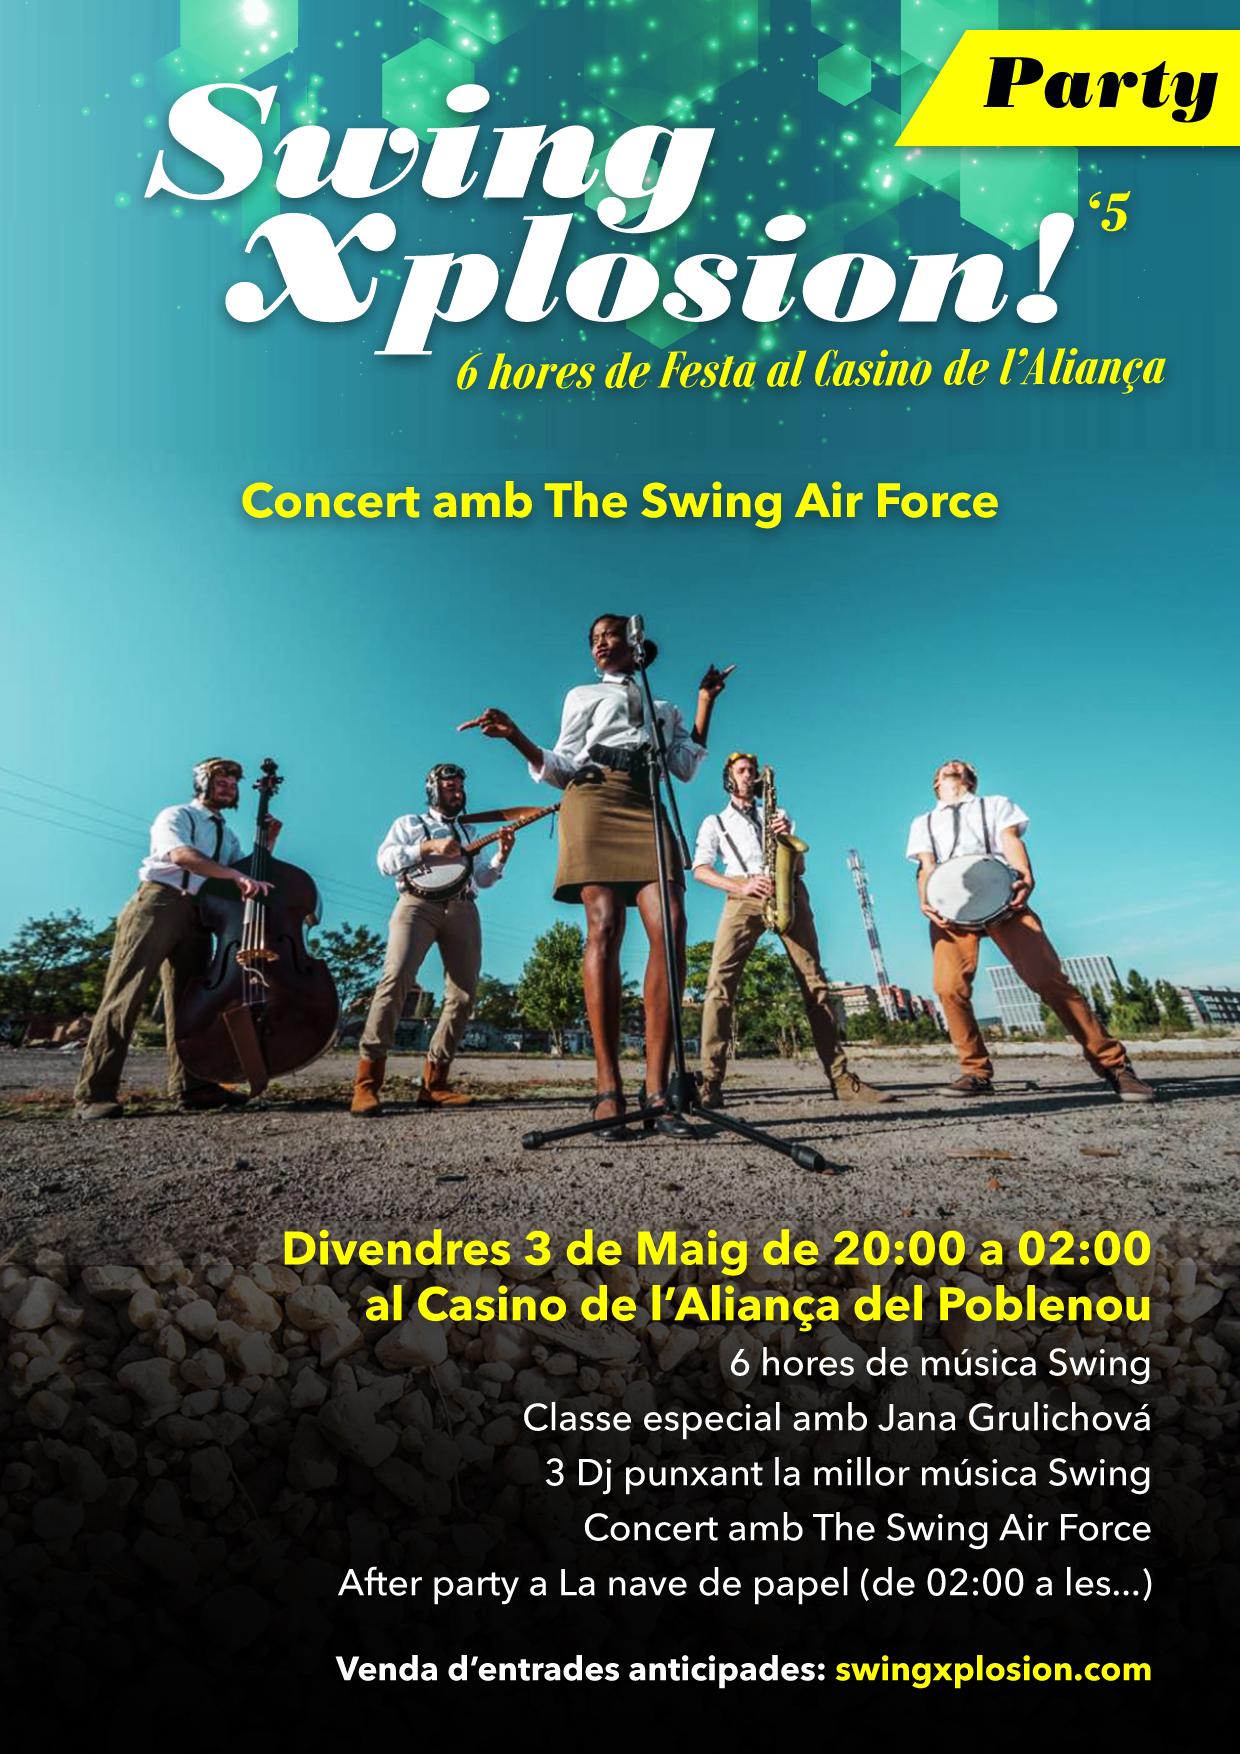 The Swing Xplosion Party! 6 hores de Festa al Casino de l'Aliança del Poblenou!